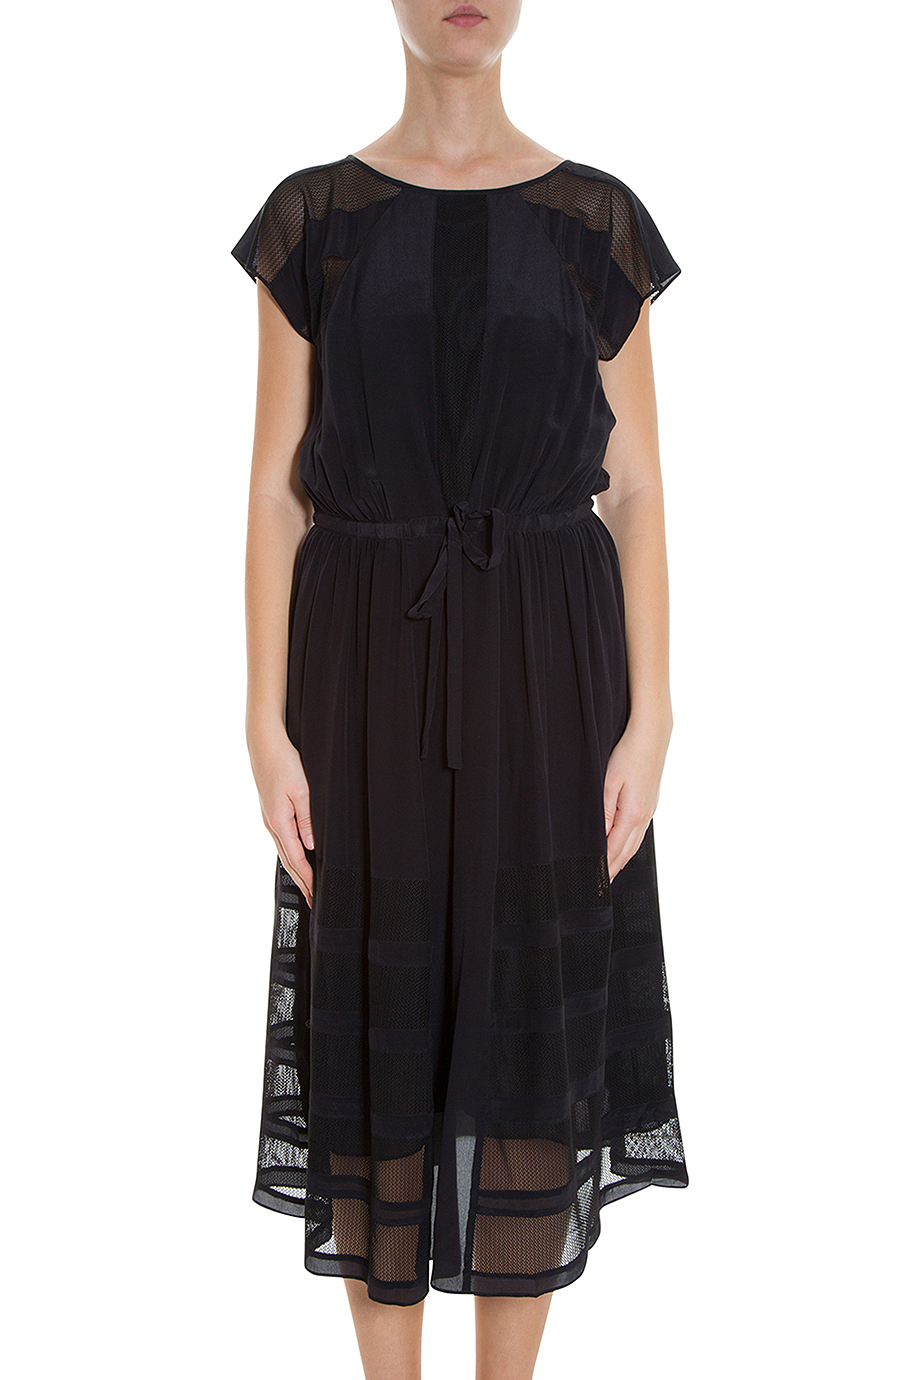 lyst paul joe genovie dress in black. Black Bedroom Furniture Sets. Home Design Ideas